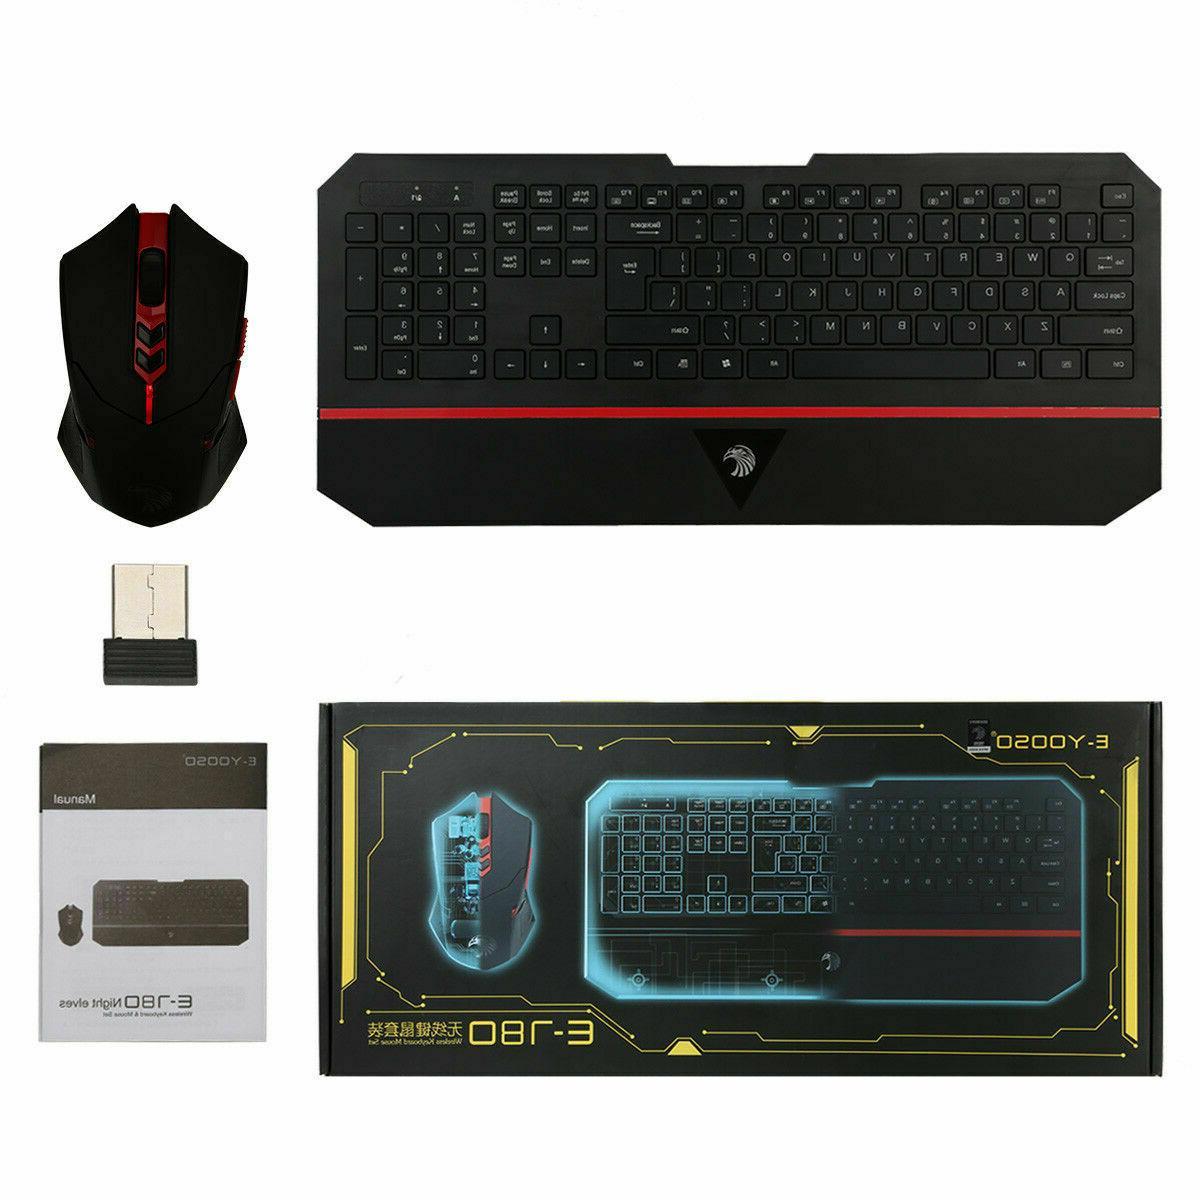 E-780 2.4GHz Wireless Gaming Keyboard Bundles